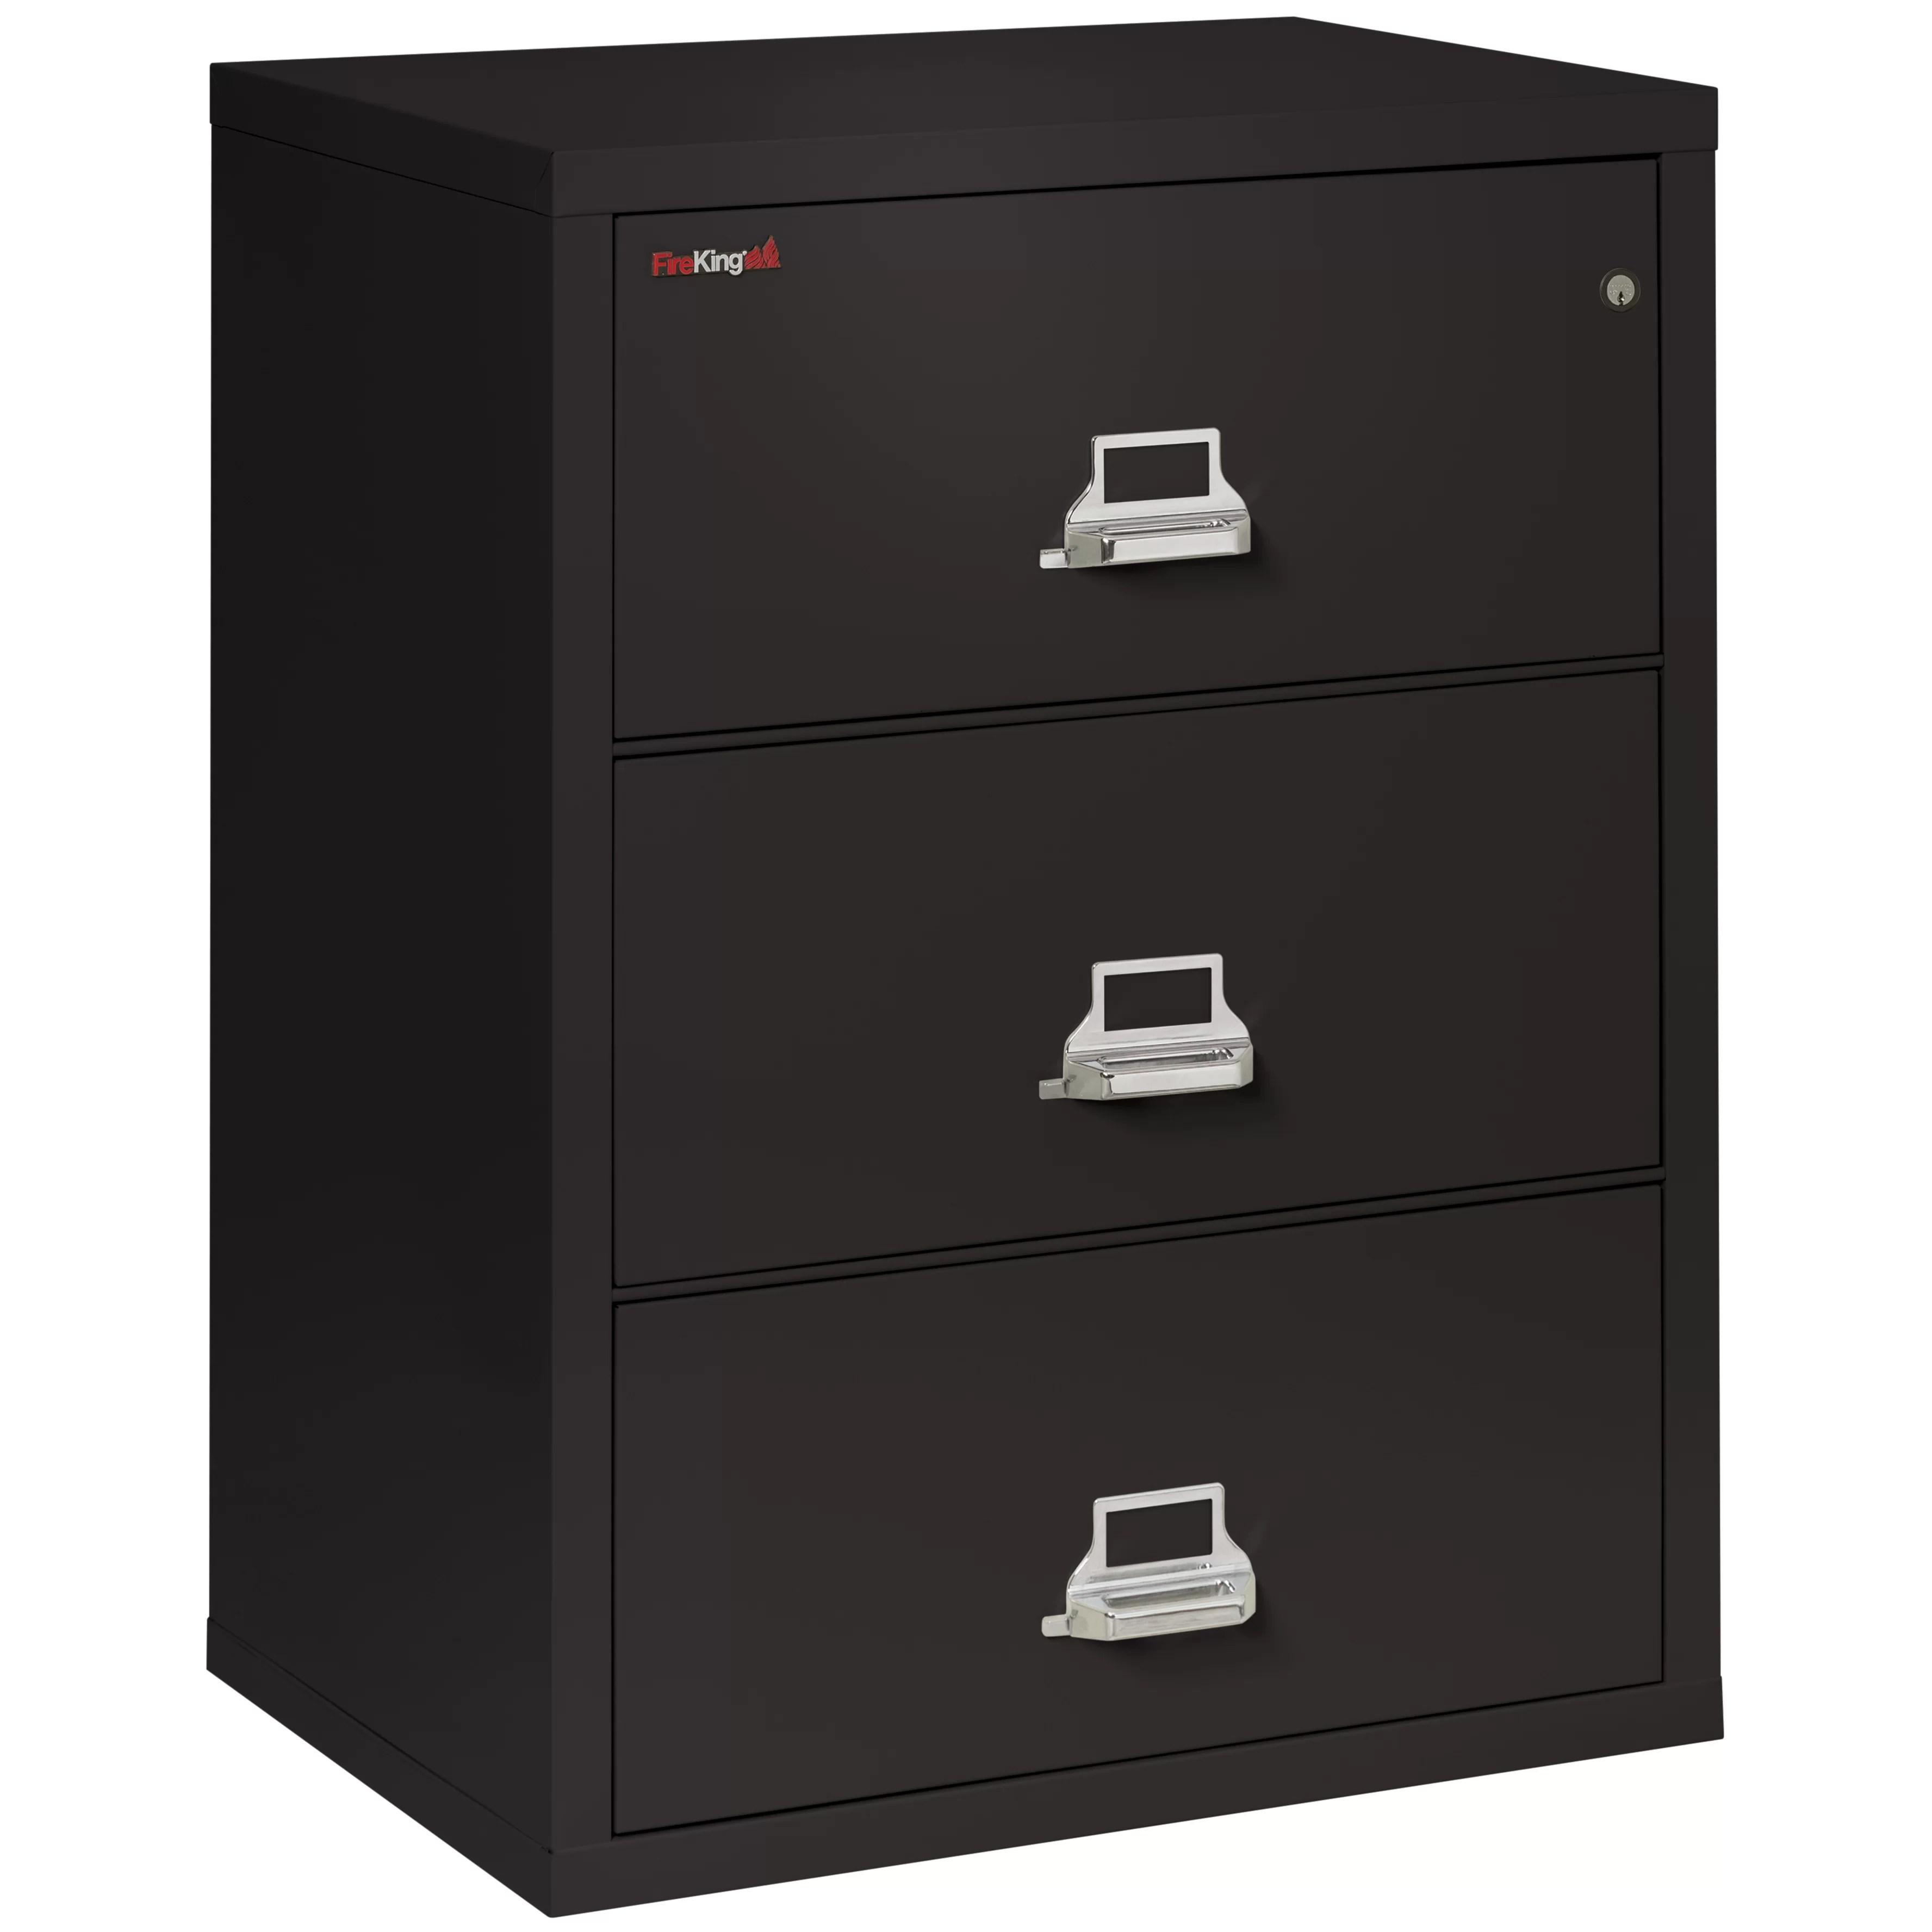 FireKing Fireproof 3Drawer Lateral File Cabinet  Wayfair